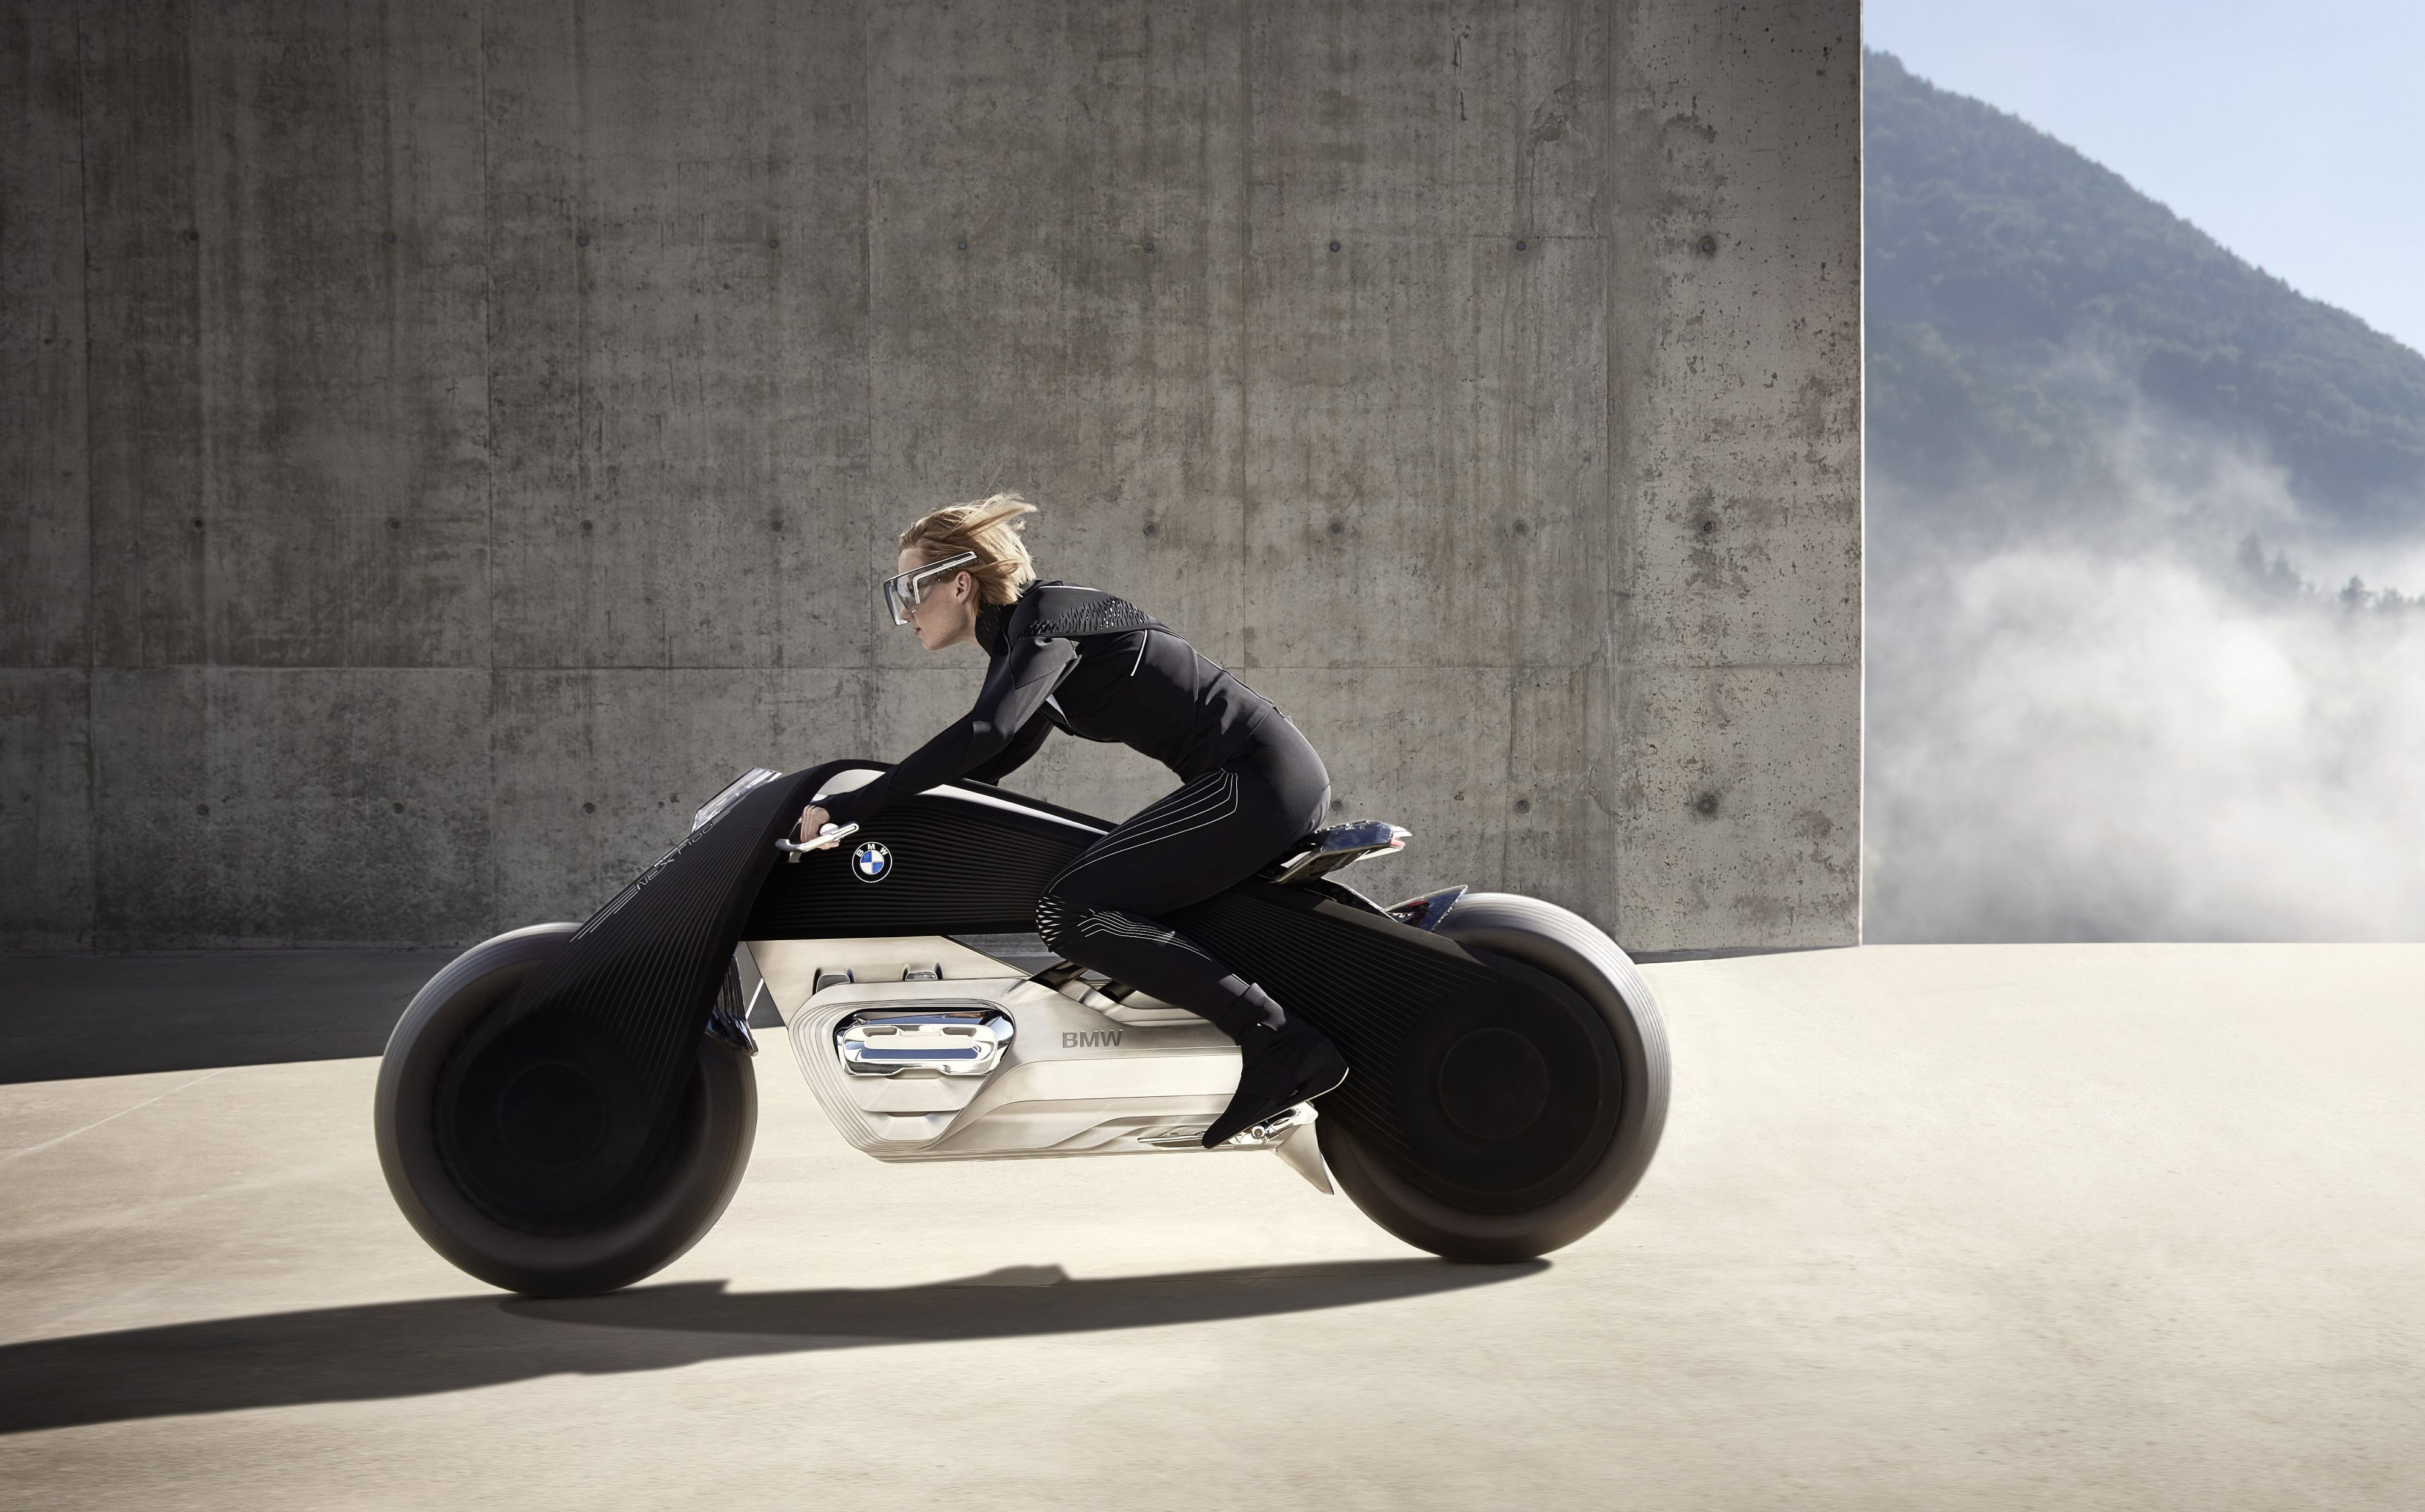 bmw-motorrad-vision-next-100-600-01